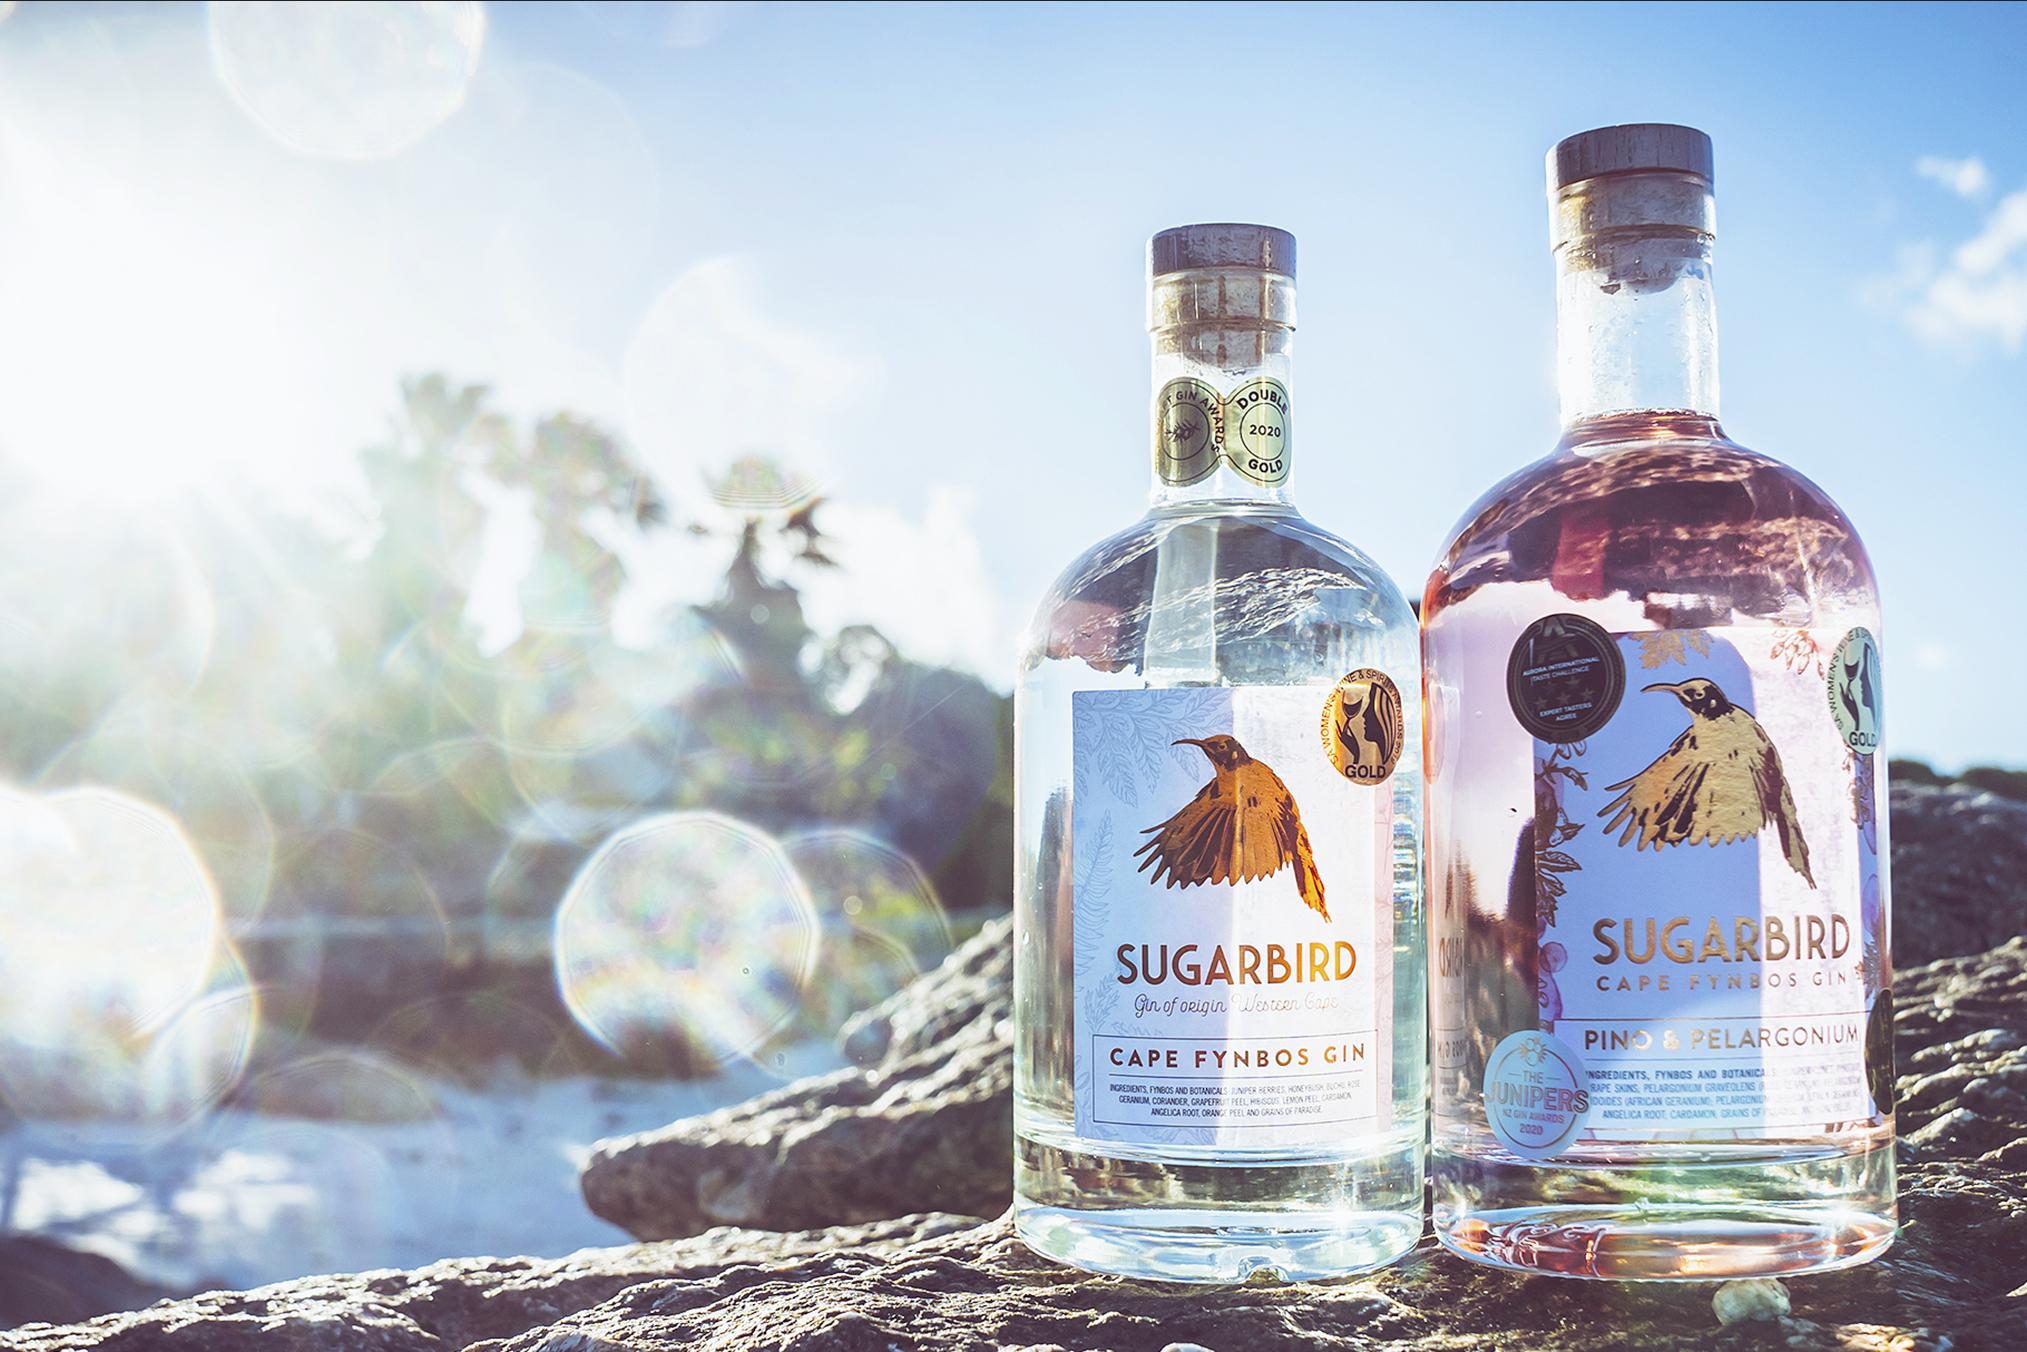 Sugarbird Craft Gin Awarded Best Premium Gin in South Africa